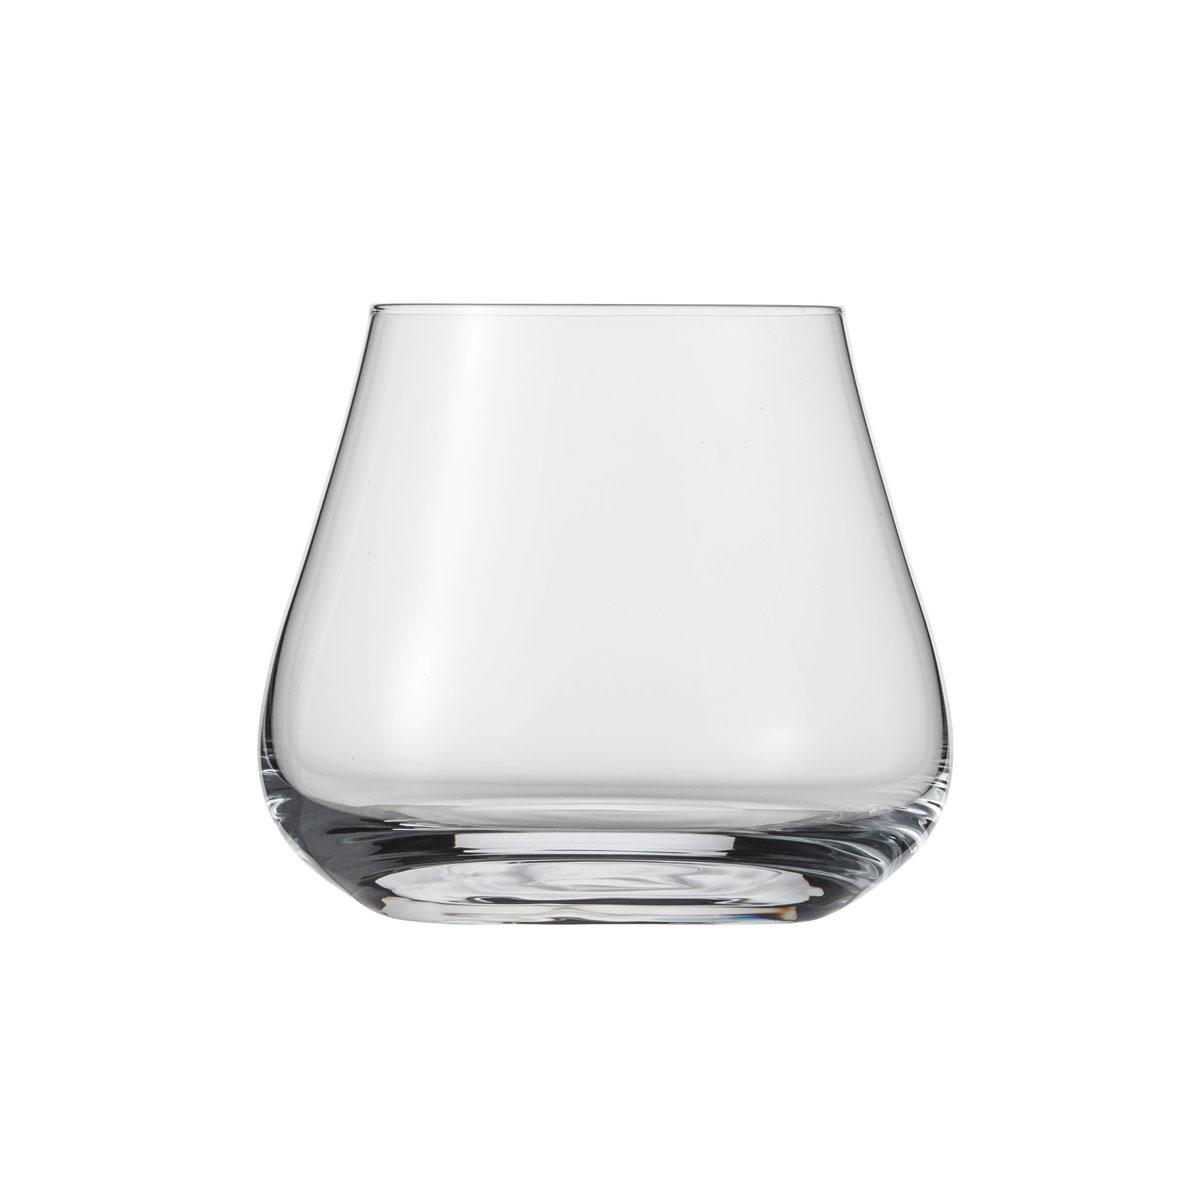 Schott Zwiesel Tritan Crystal, Air Crystal Whiskey Glass, Single